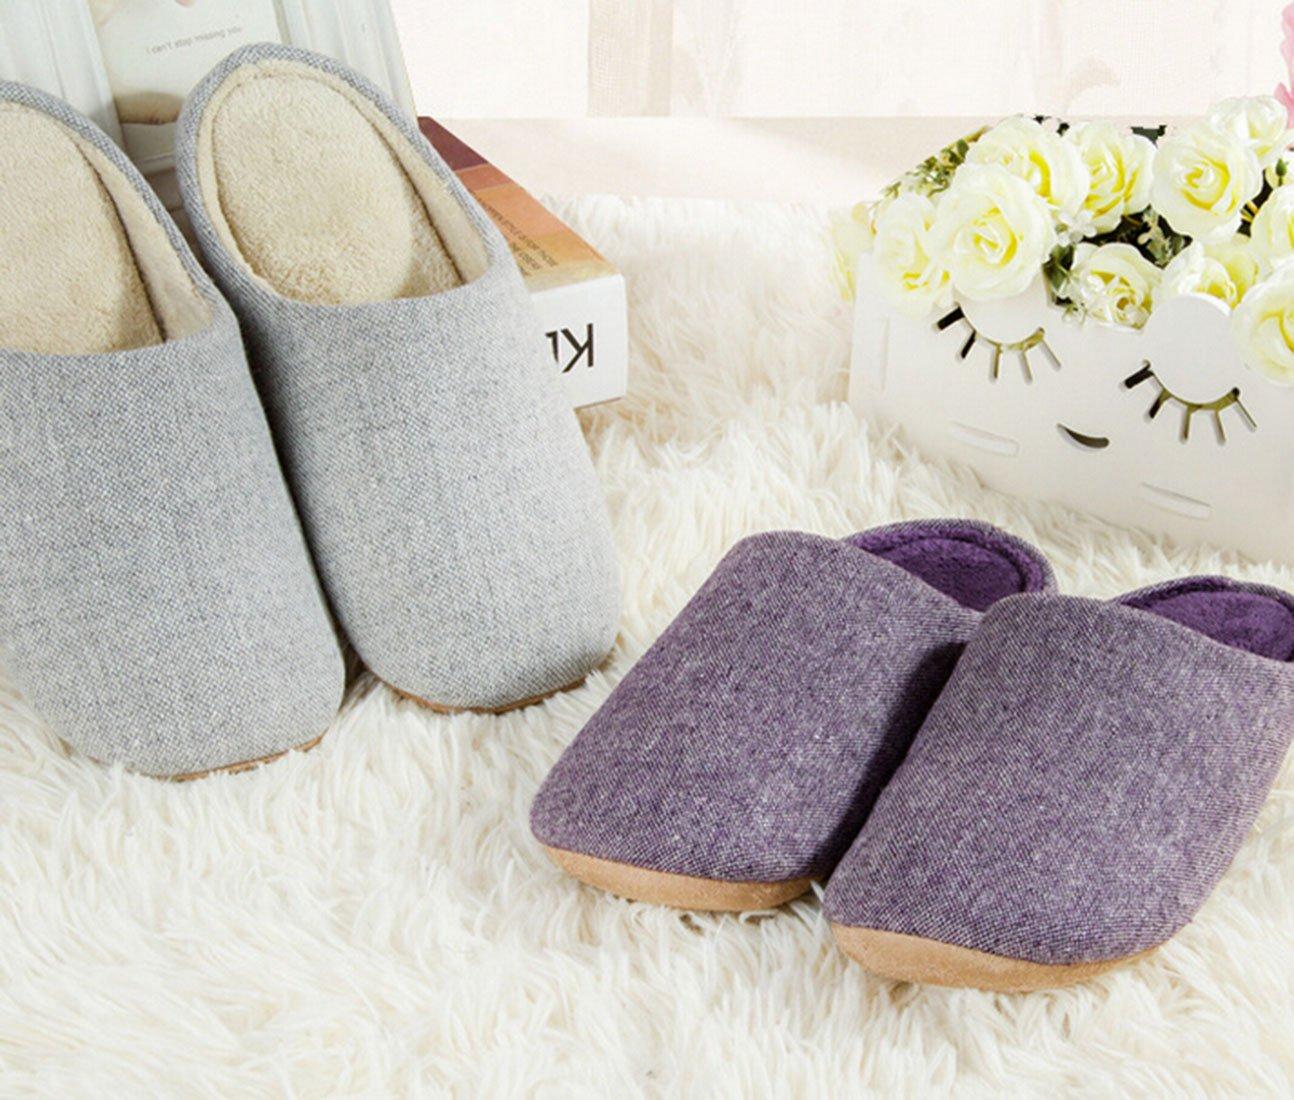 Bronze Times(TM) House Slippers,Womens Coral Fleece Memmory Foam Indoor Footwear,grey,M by Bronze Times (Image #5)